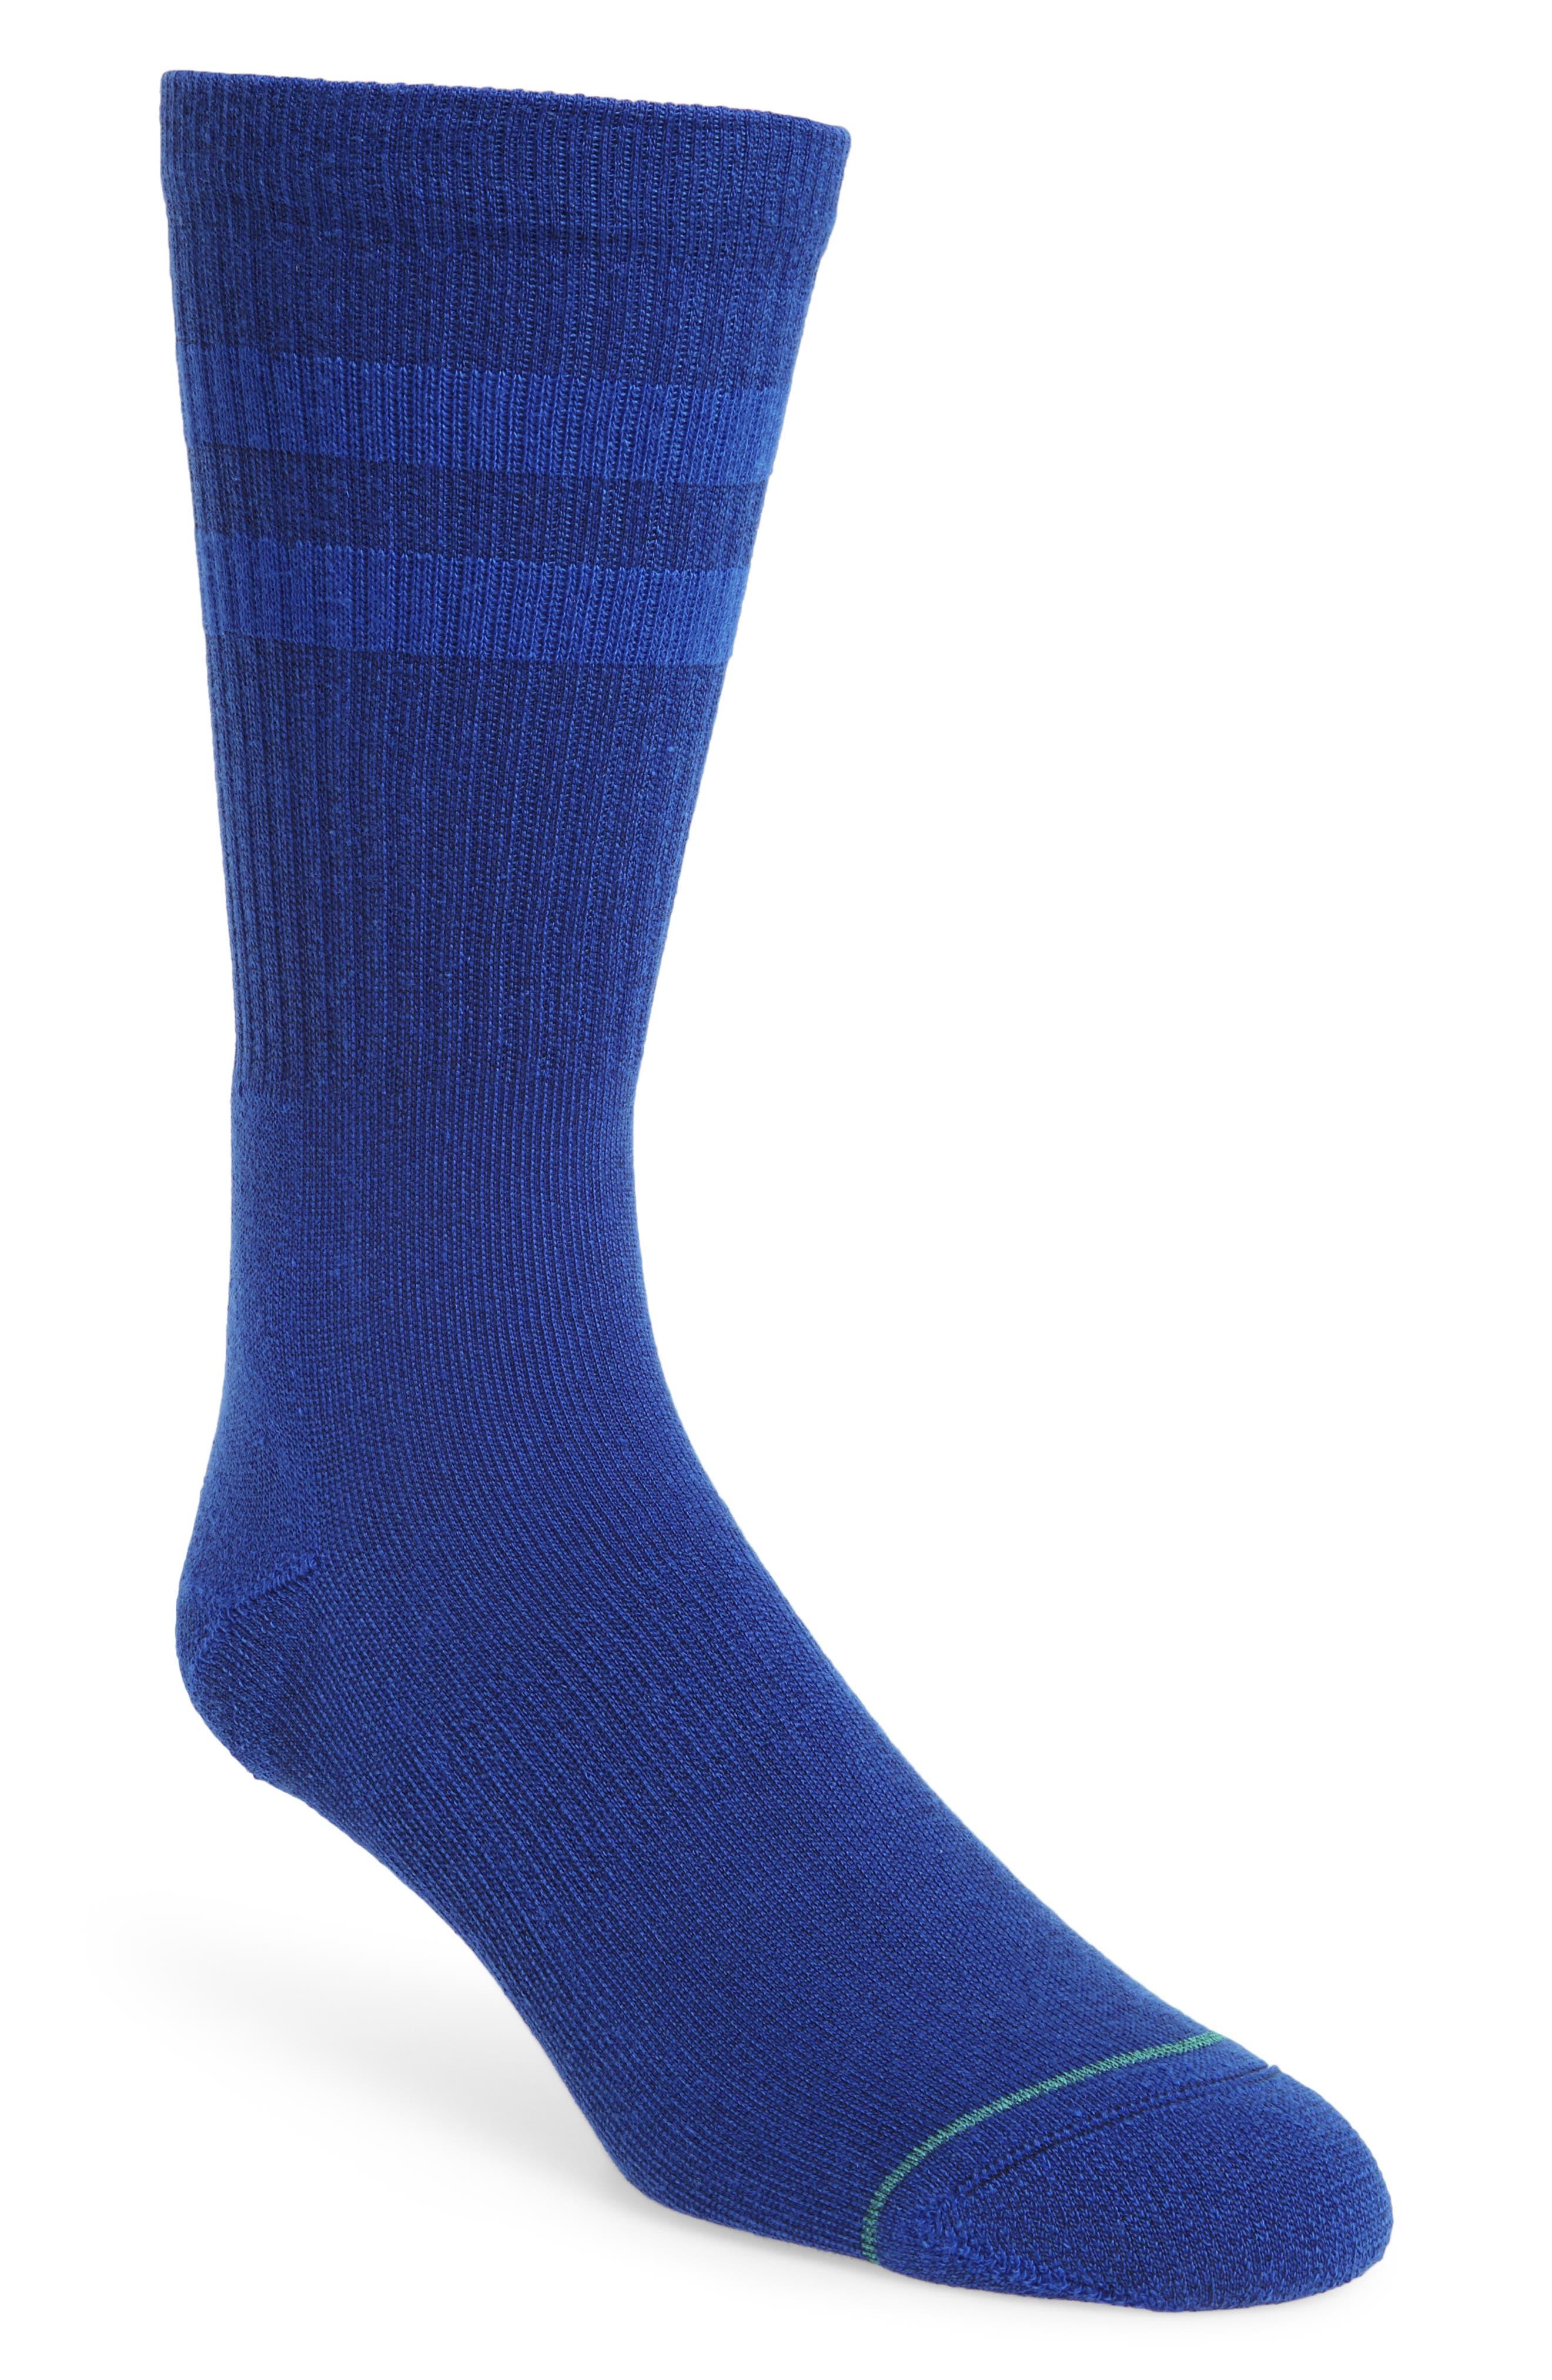 Main Image - Stance Joven Classic Crew Socks